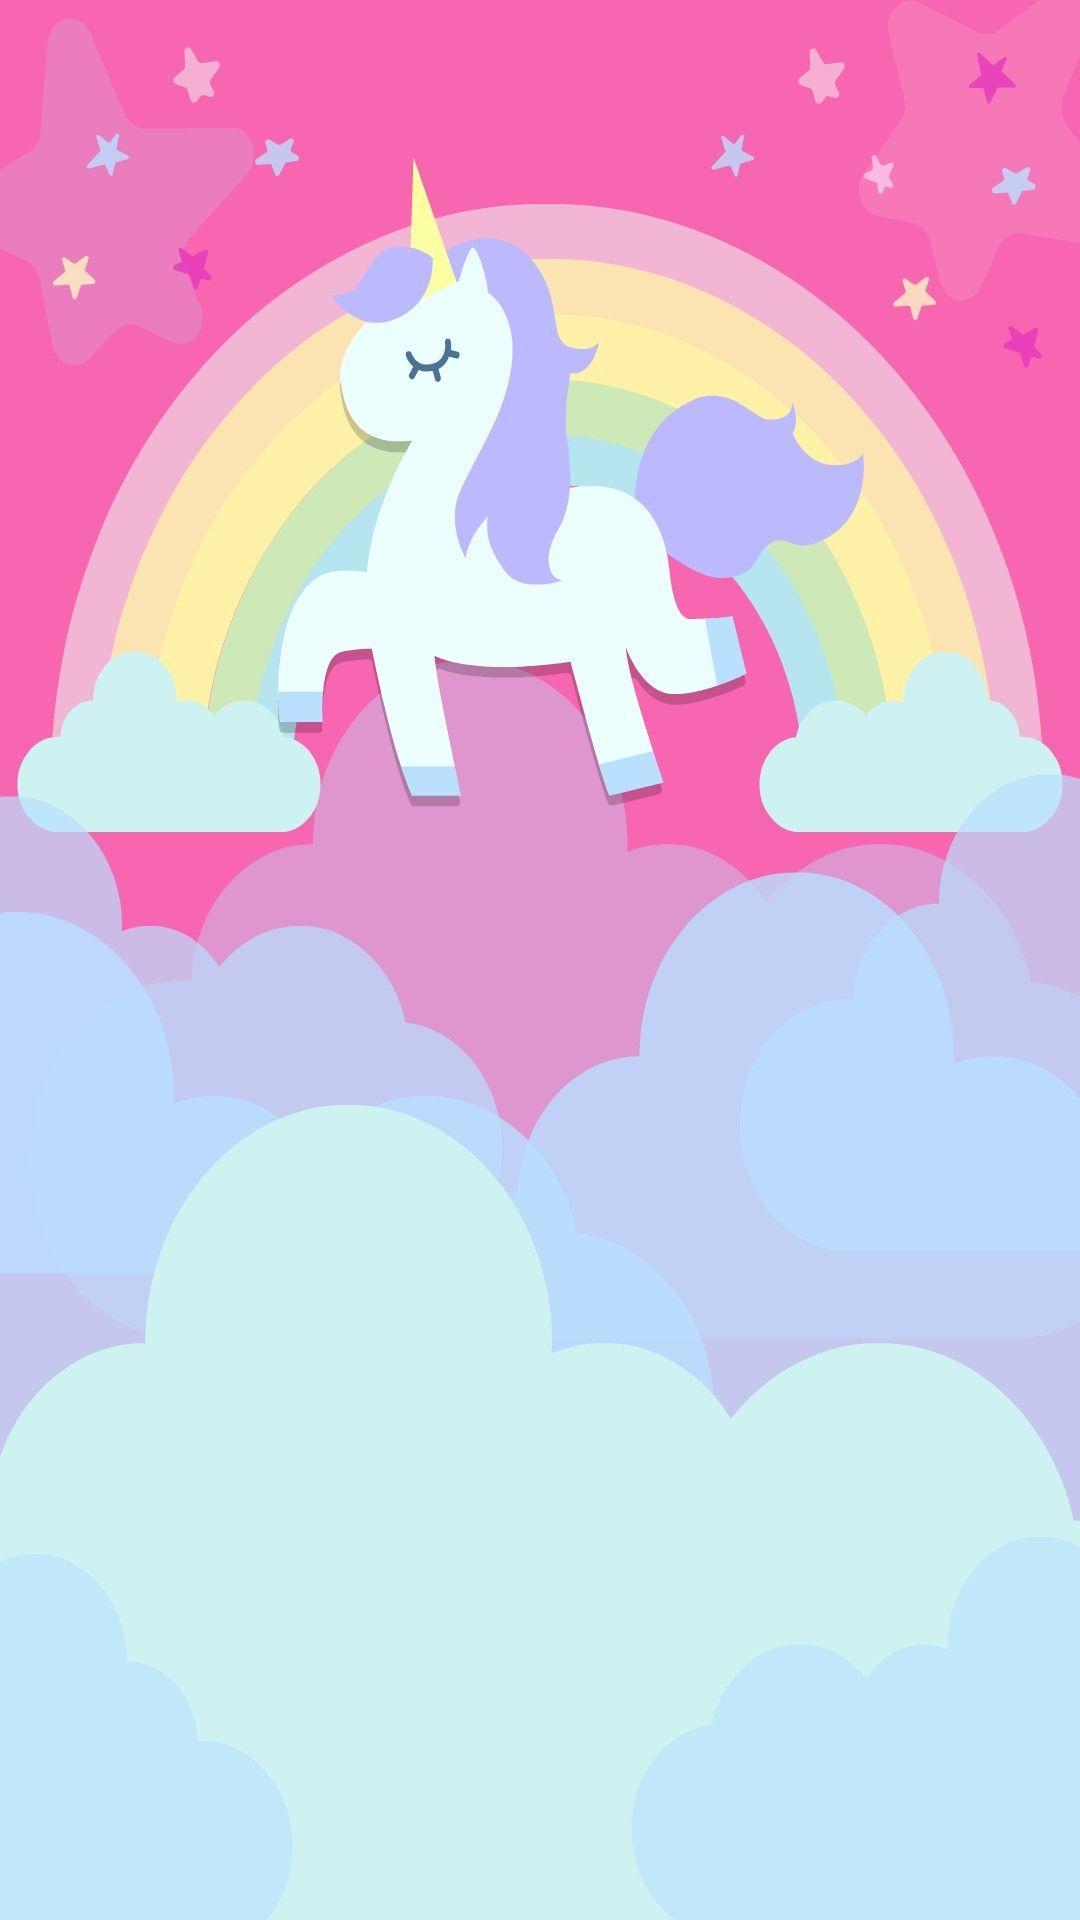 Rainbow Unicorn Wallpapers Wallpaper Cave Pertaining To Cartoon Unicorn Wallpapers In 2020 Unicorn Wallpaper Cute Unicorn Wallpaper Unicorn Backgrounds